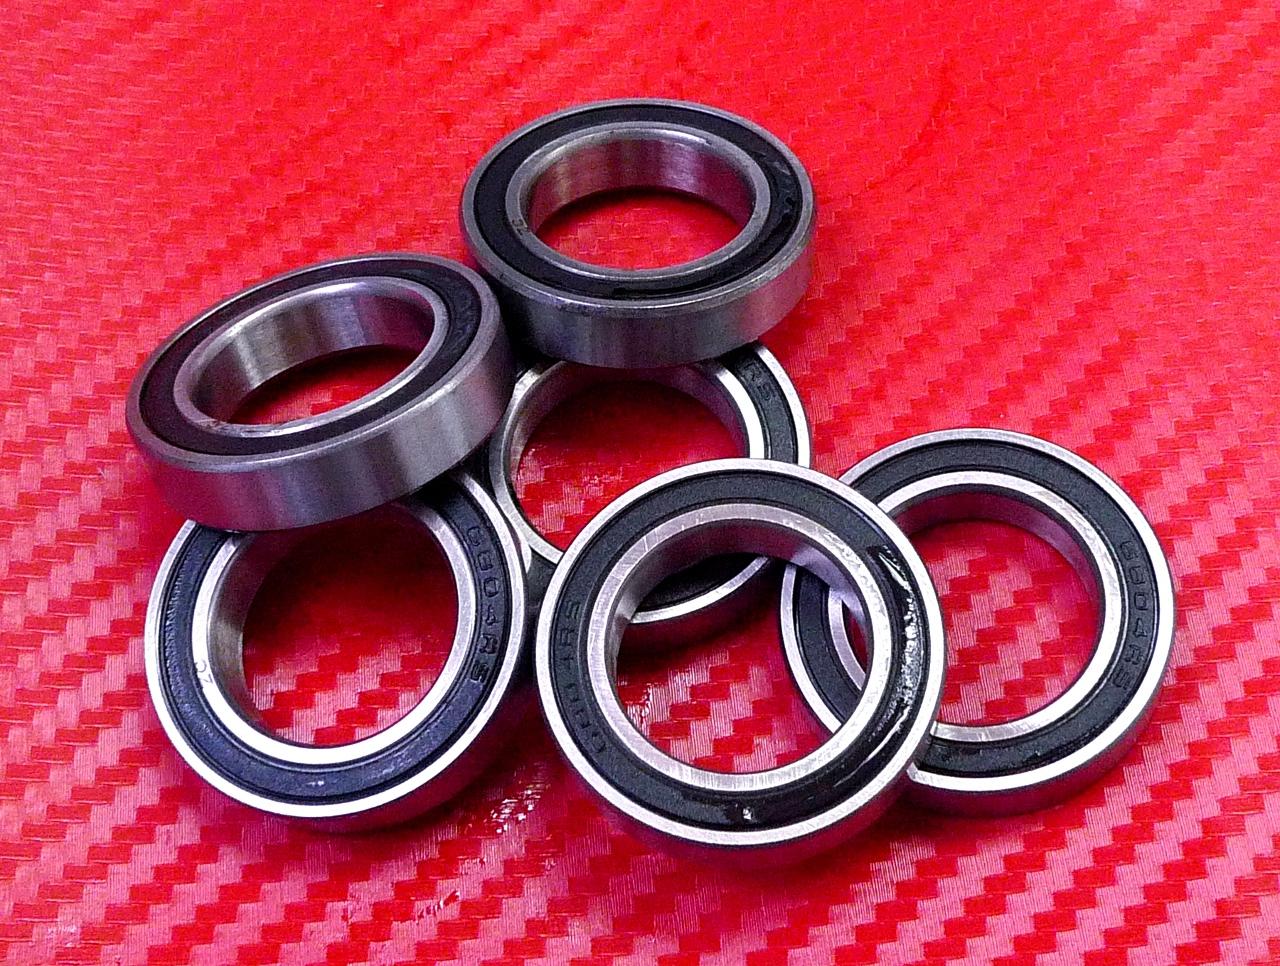 10pcs Rubber Sealed Ball Bearing Bearings Black 6803-2RS 6803 RS 17x26x5 mm